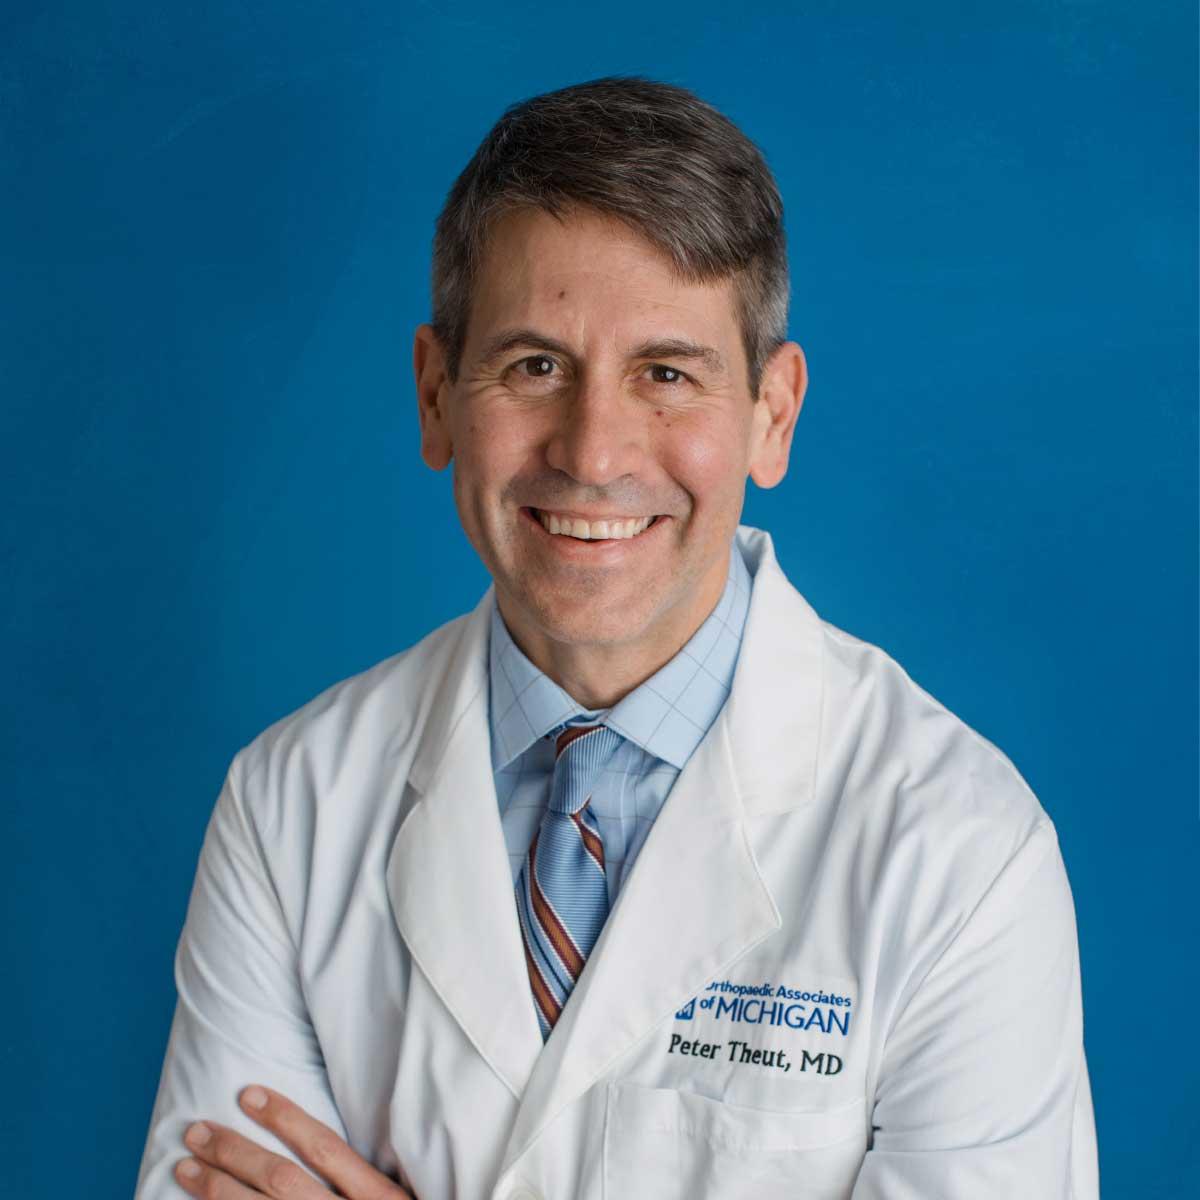 Peter Theut, MD